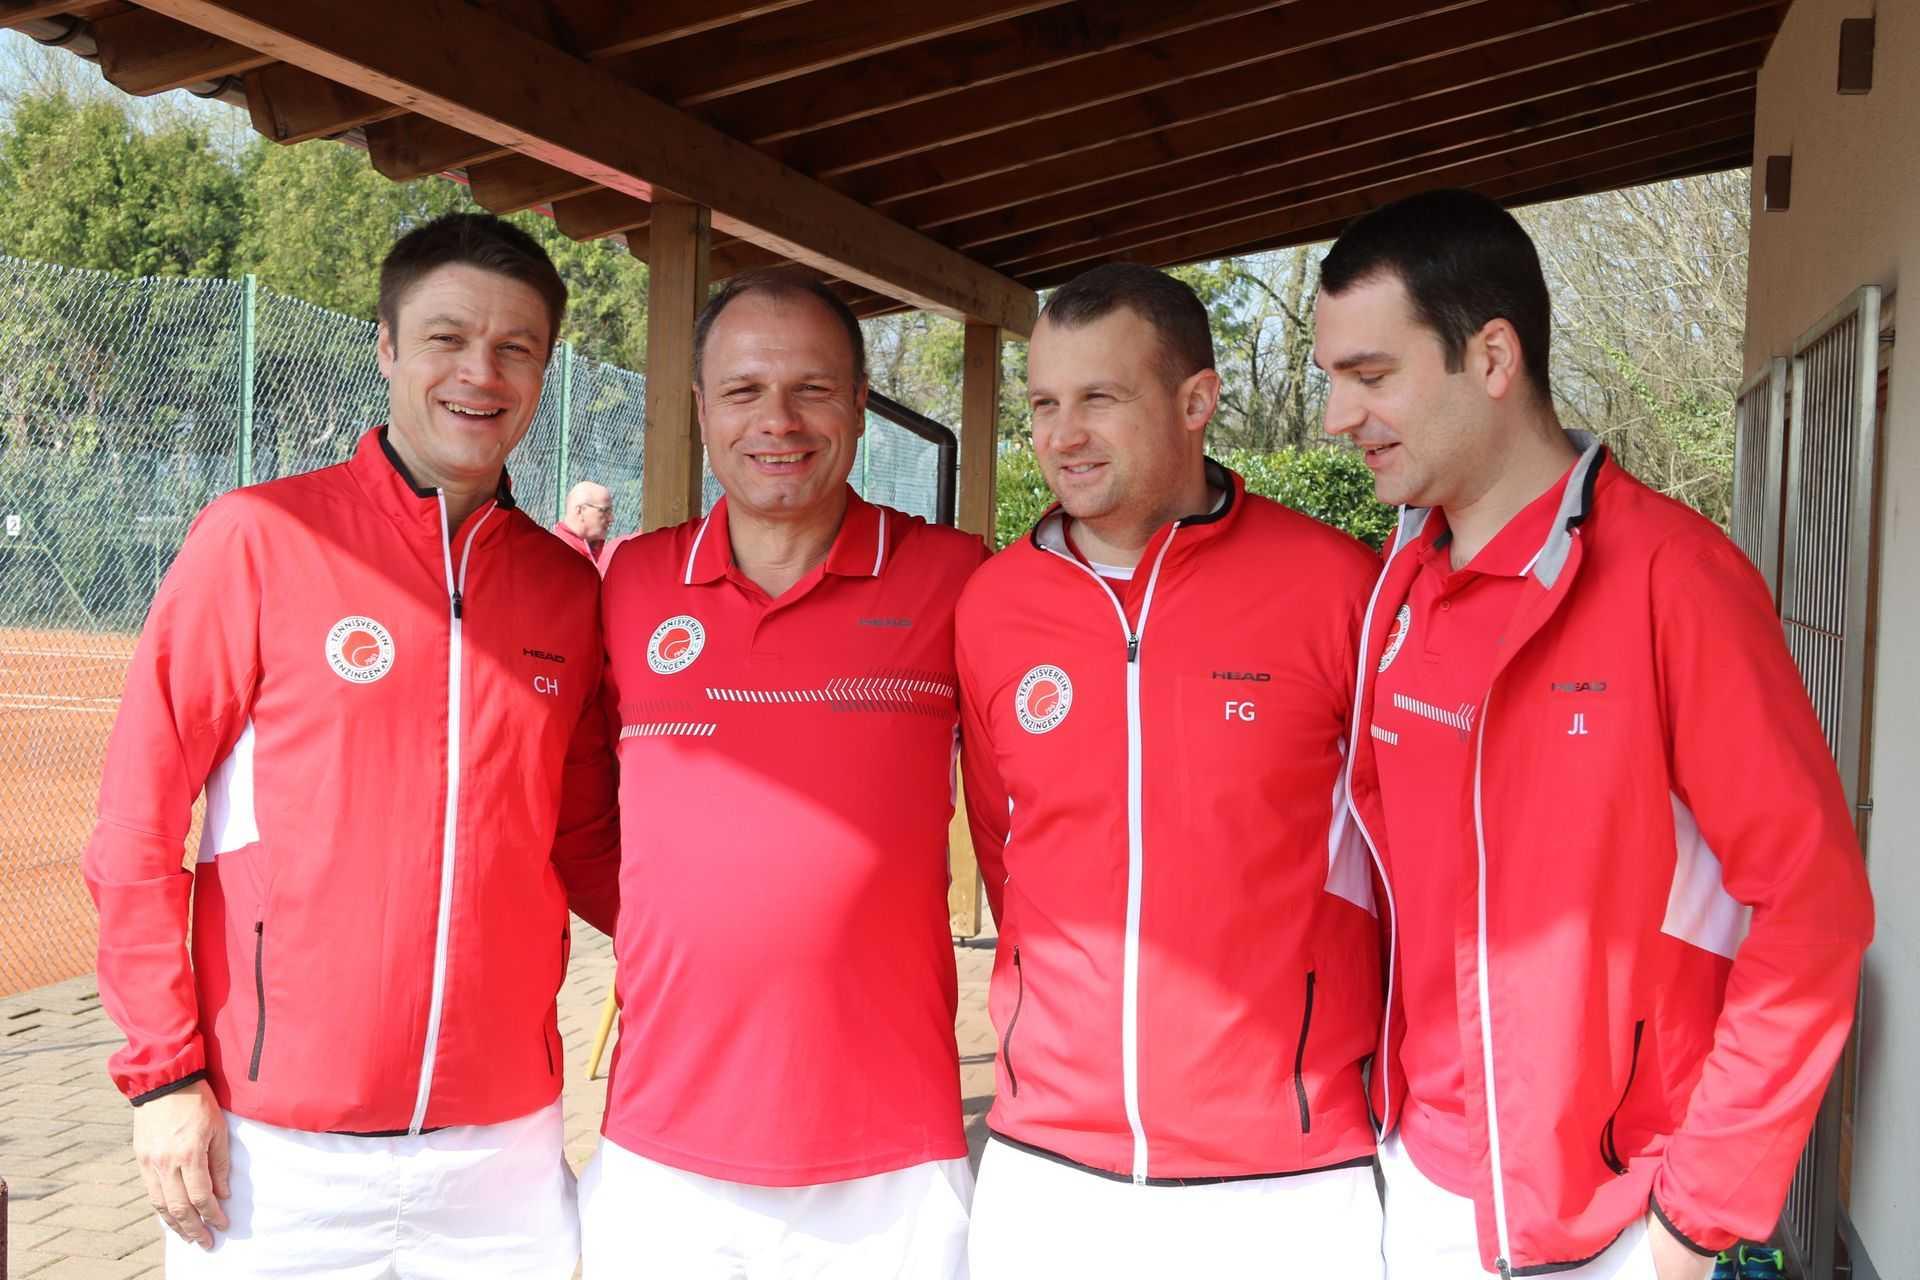 Tennisverein Kenzingen manschafte 35